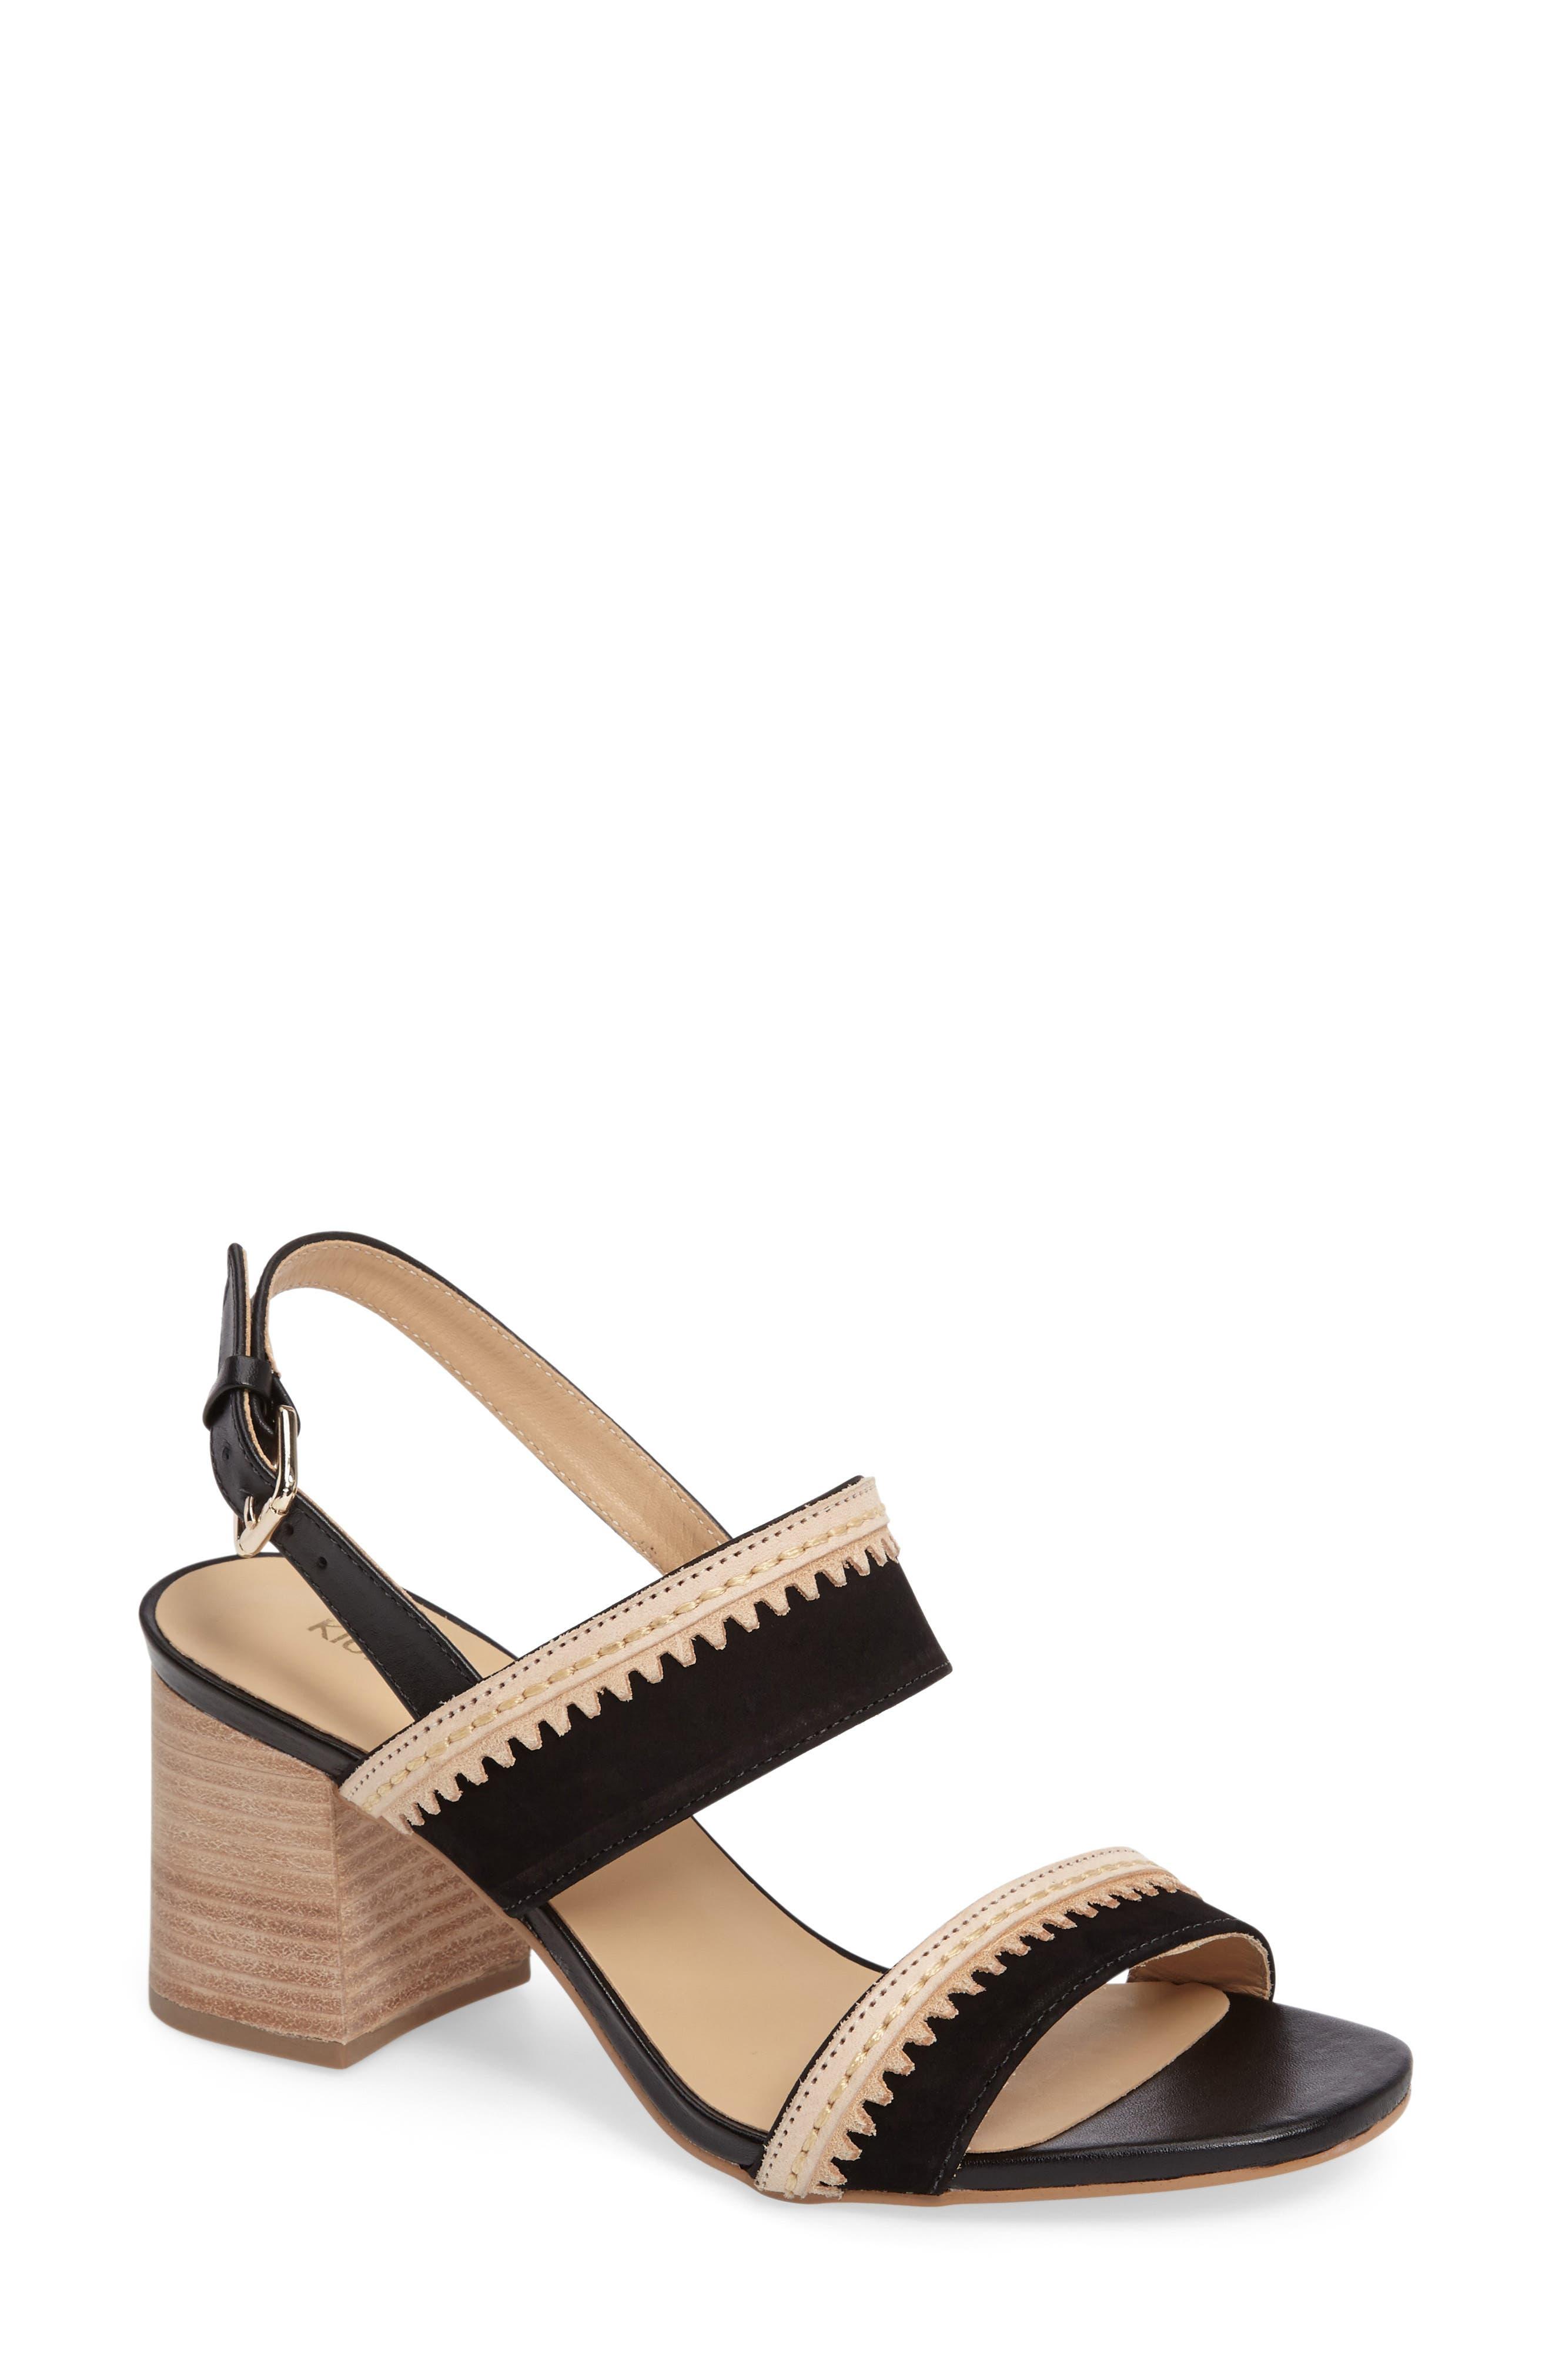 Rycca Block Heel Sandal,                         Main,                         color,